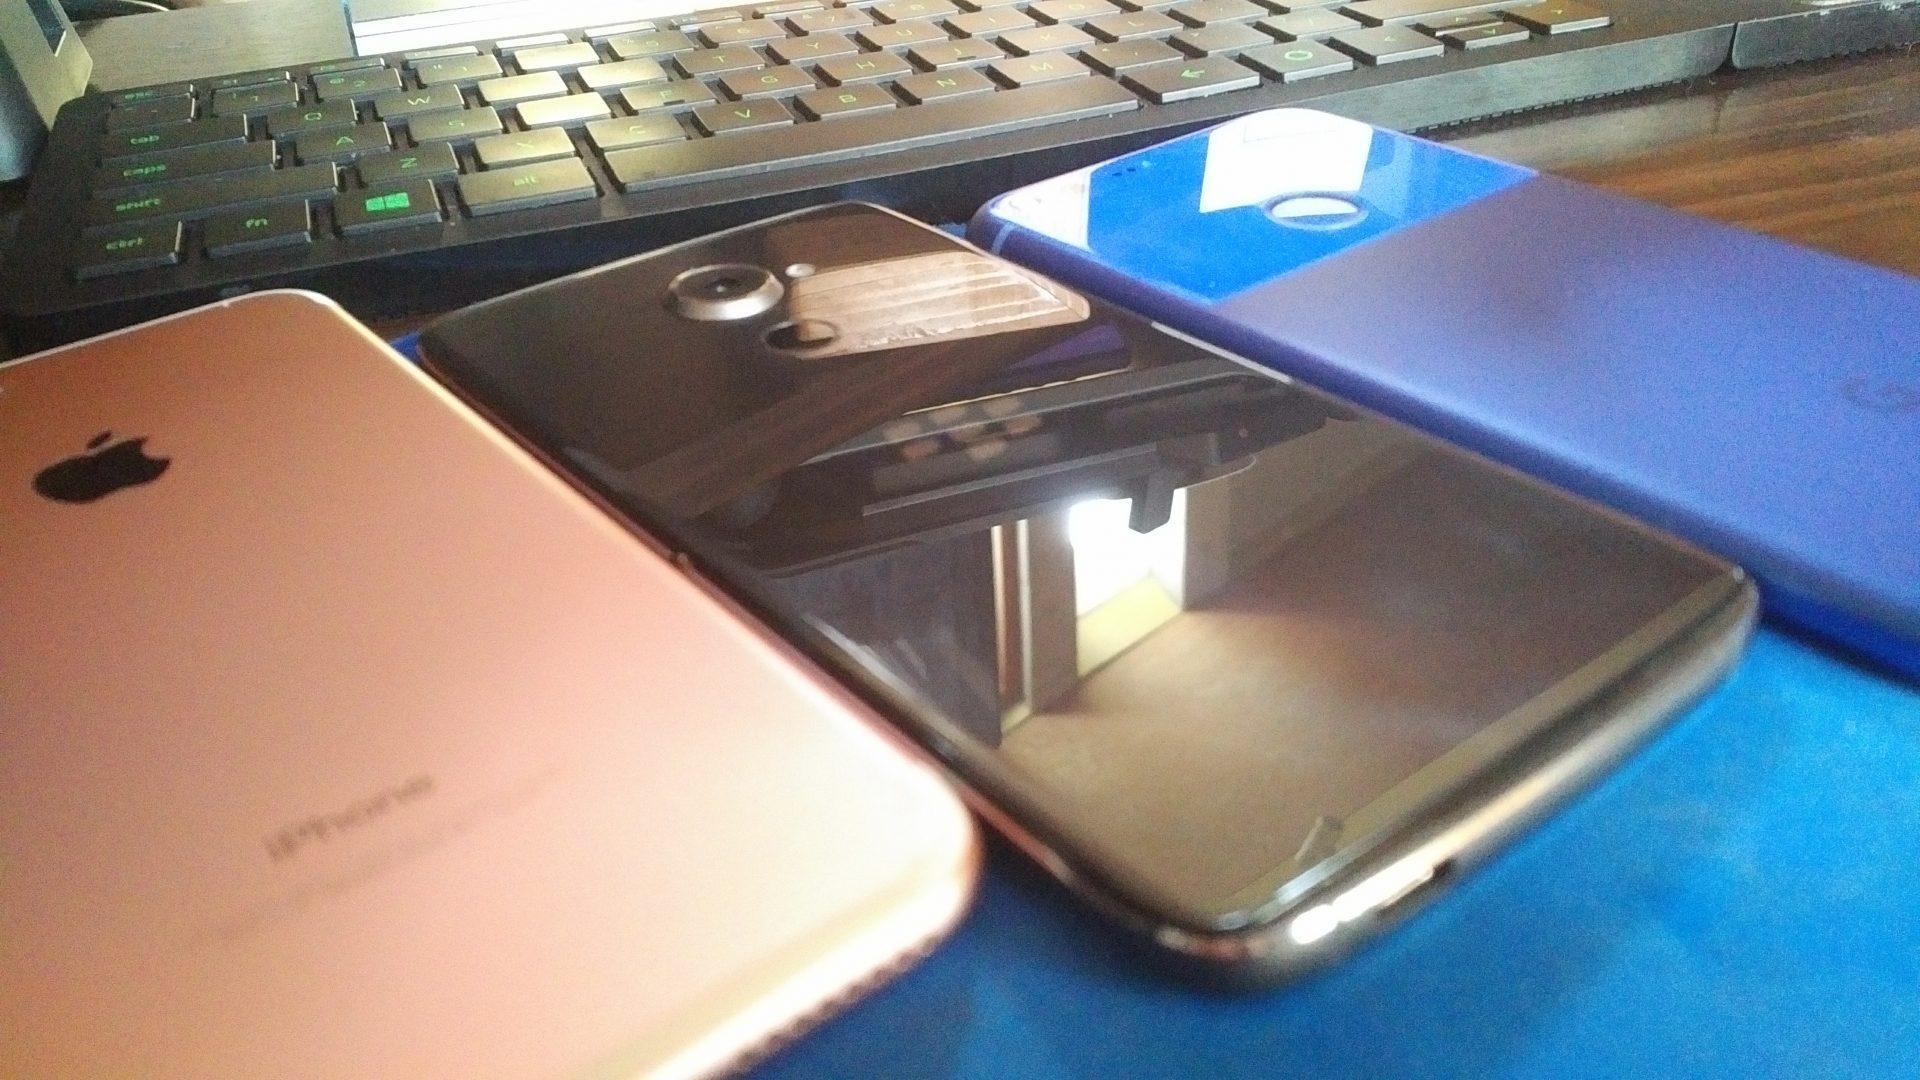 「BlackBerry DTEK60」はケースを付けてもリアカメラが出っ張る